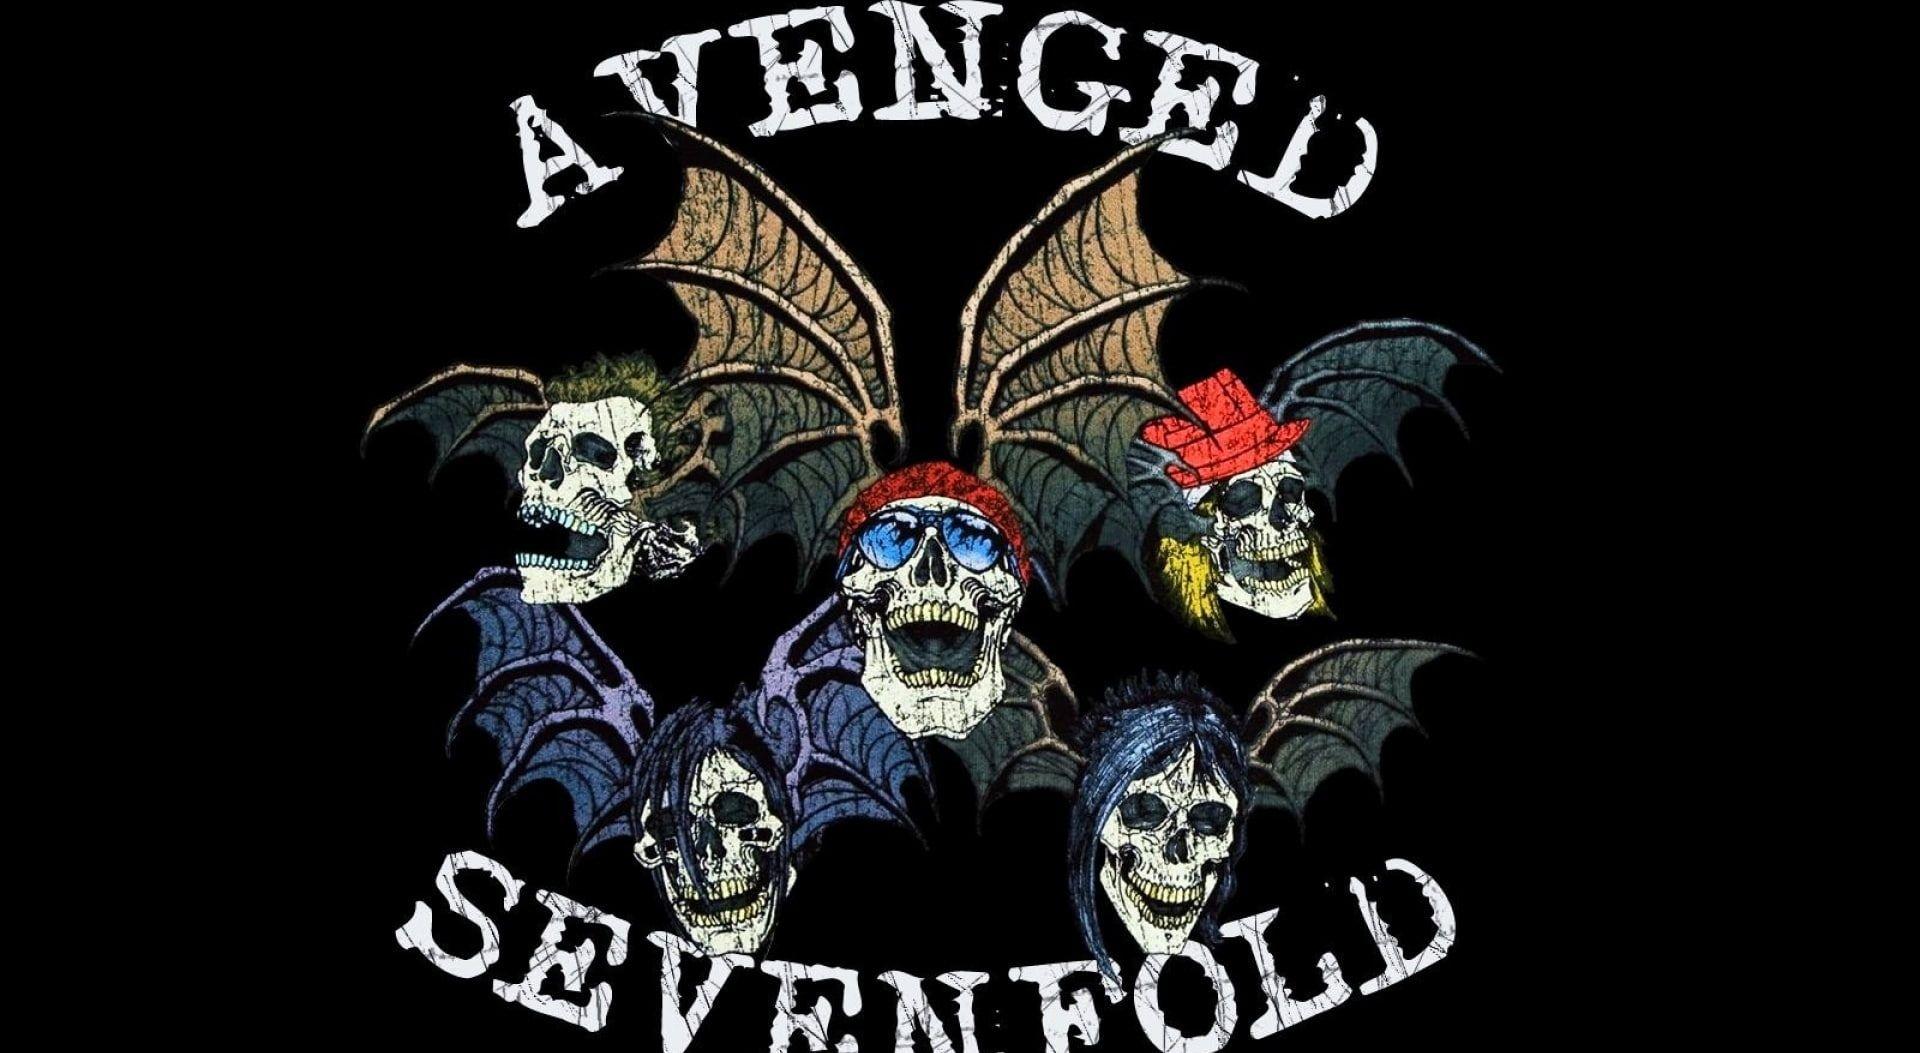 Avenged Sevenfold Logo, A venged sevenfold illustration